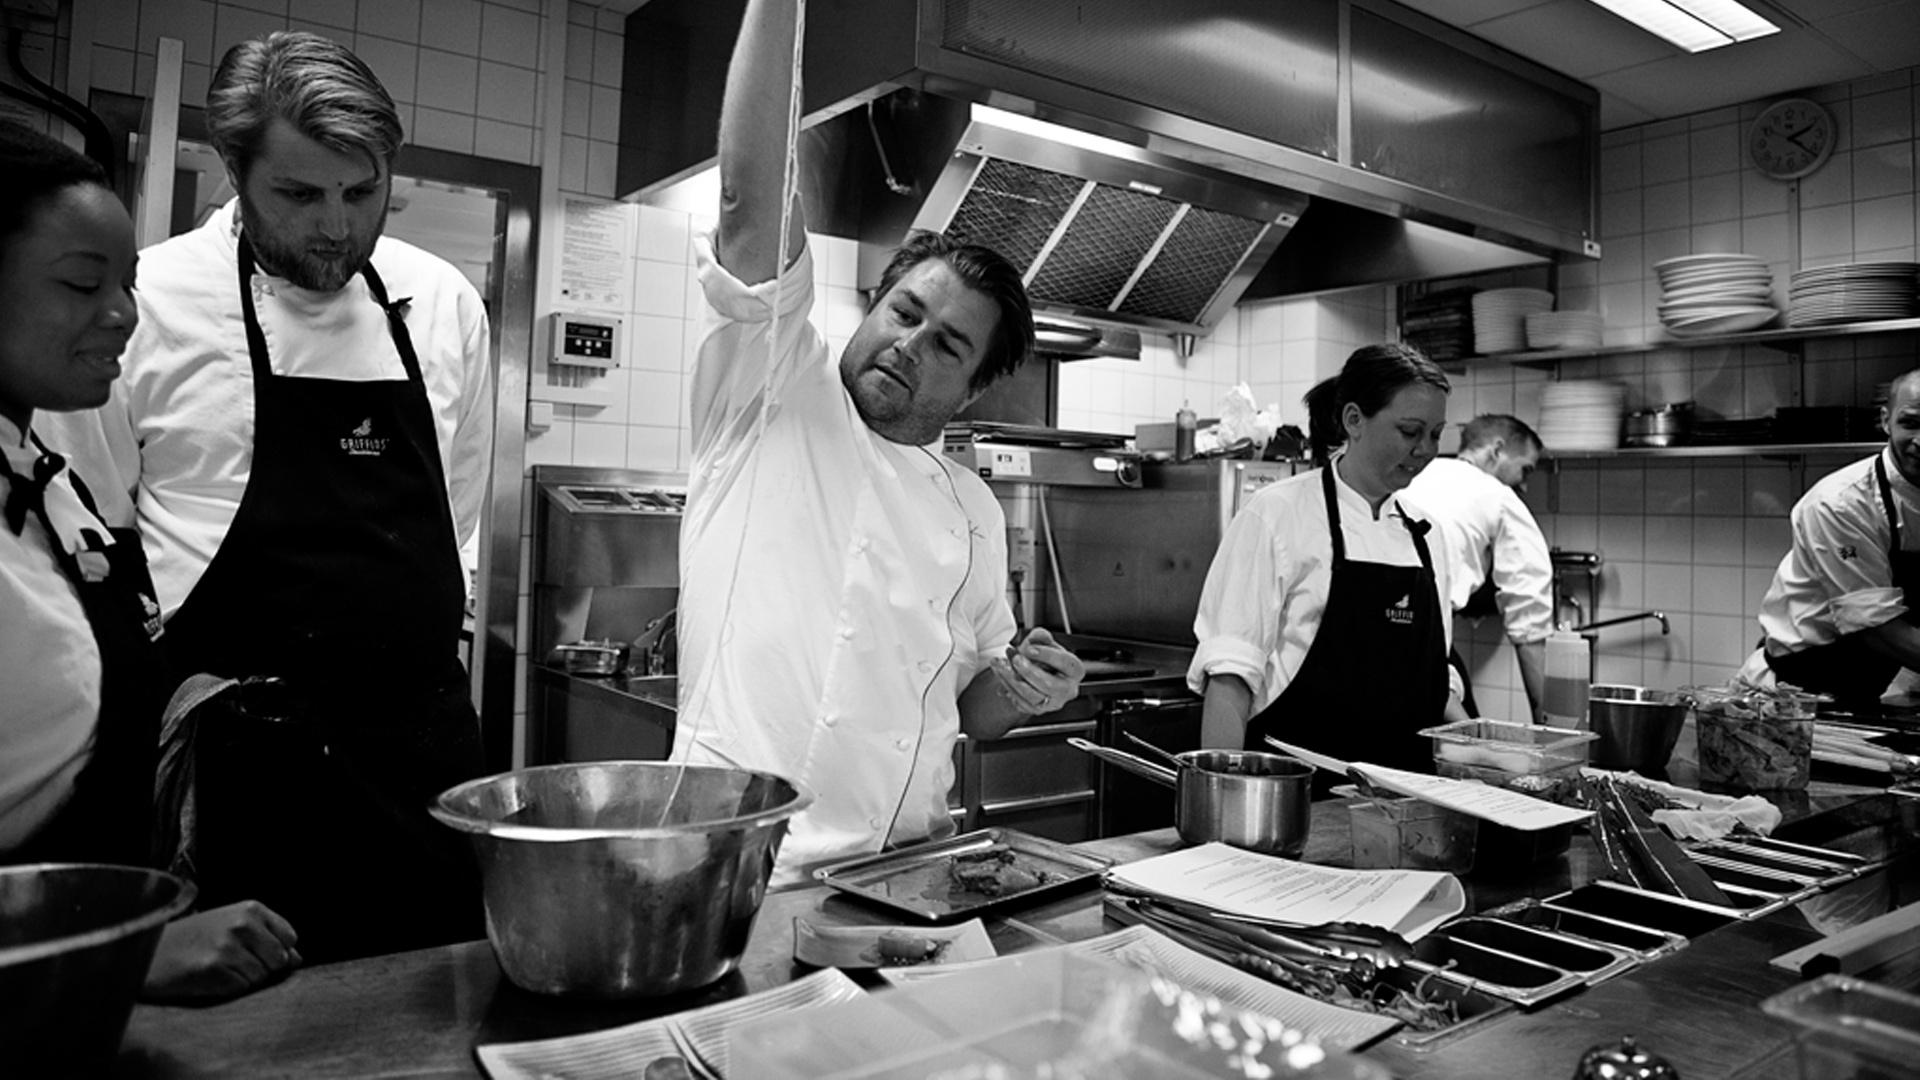 Product Restaurant Chef (Photo: MusicPartner)